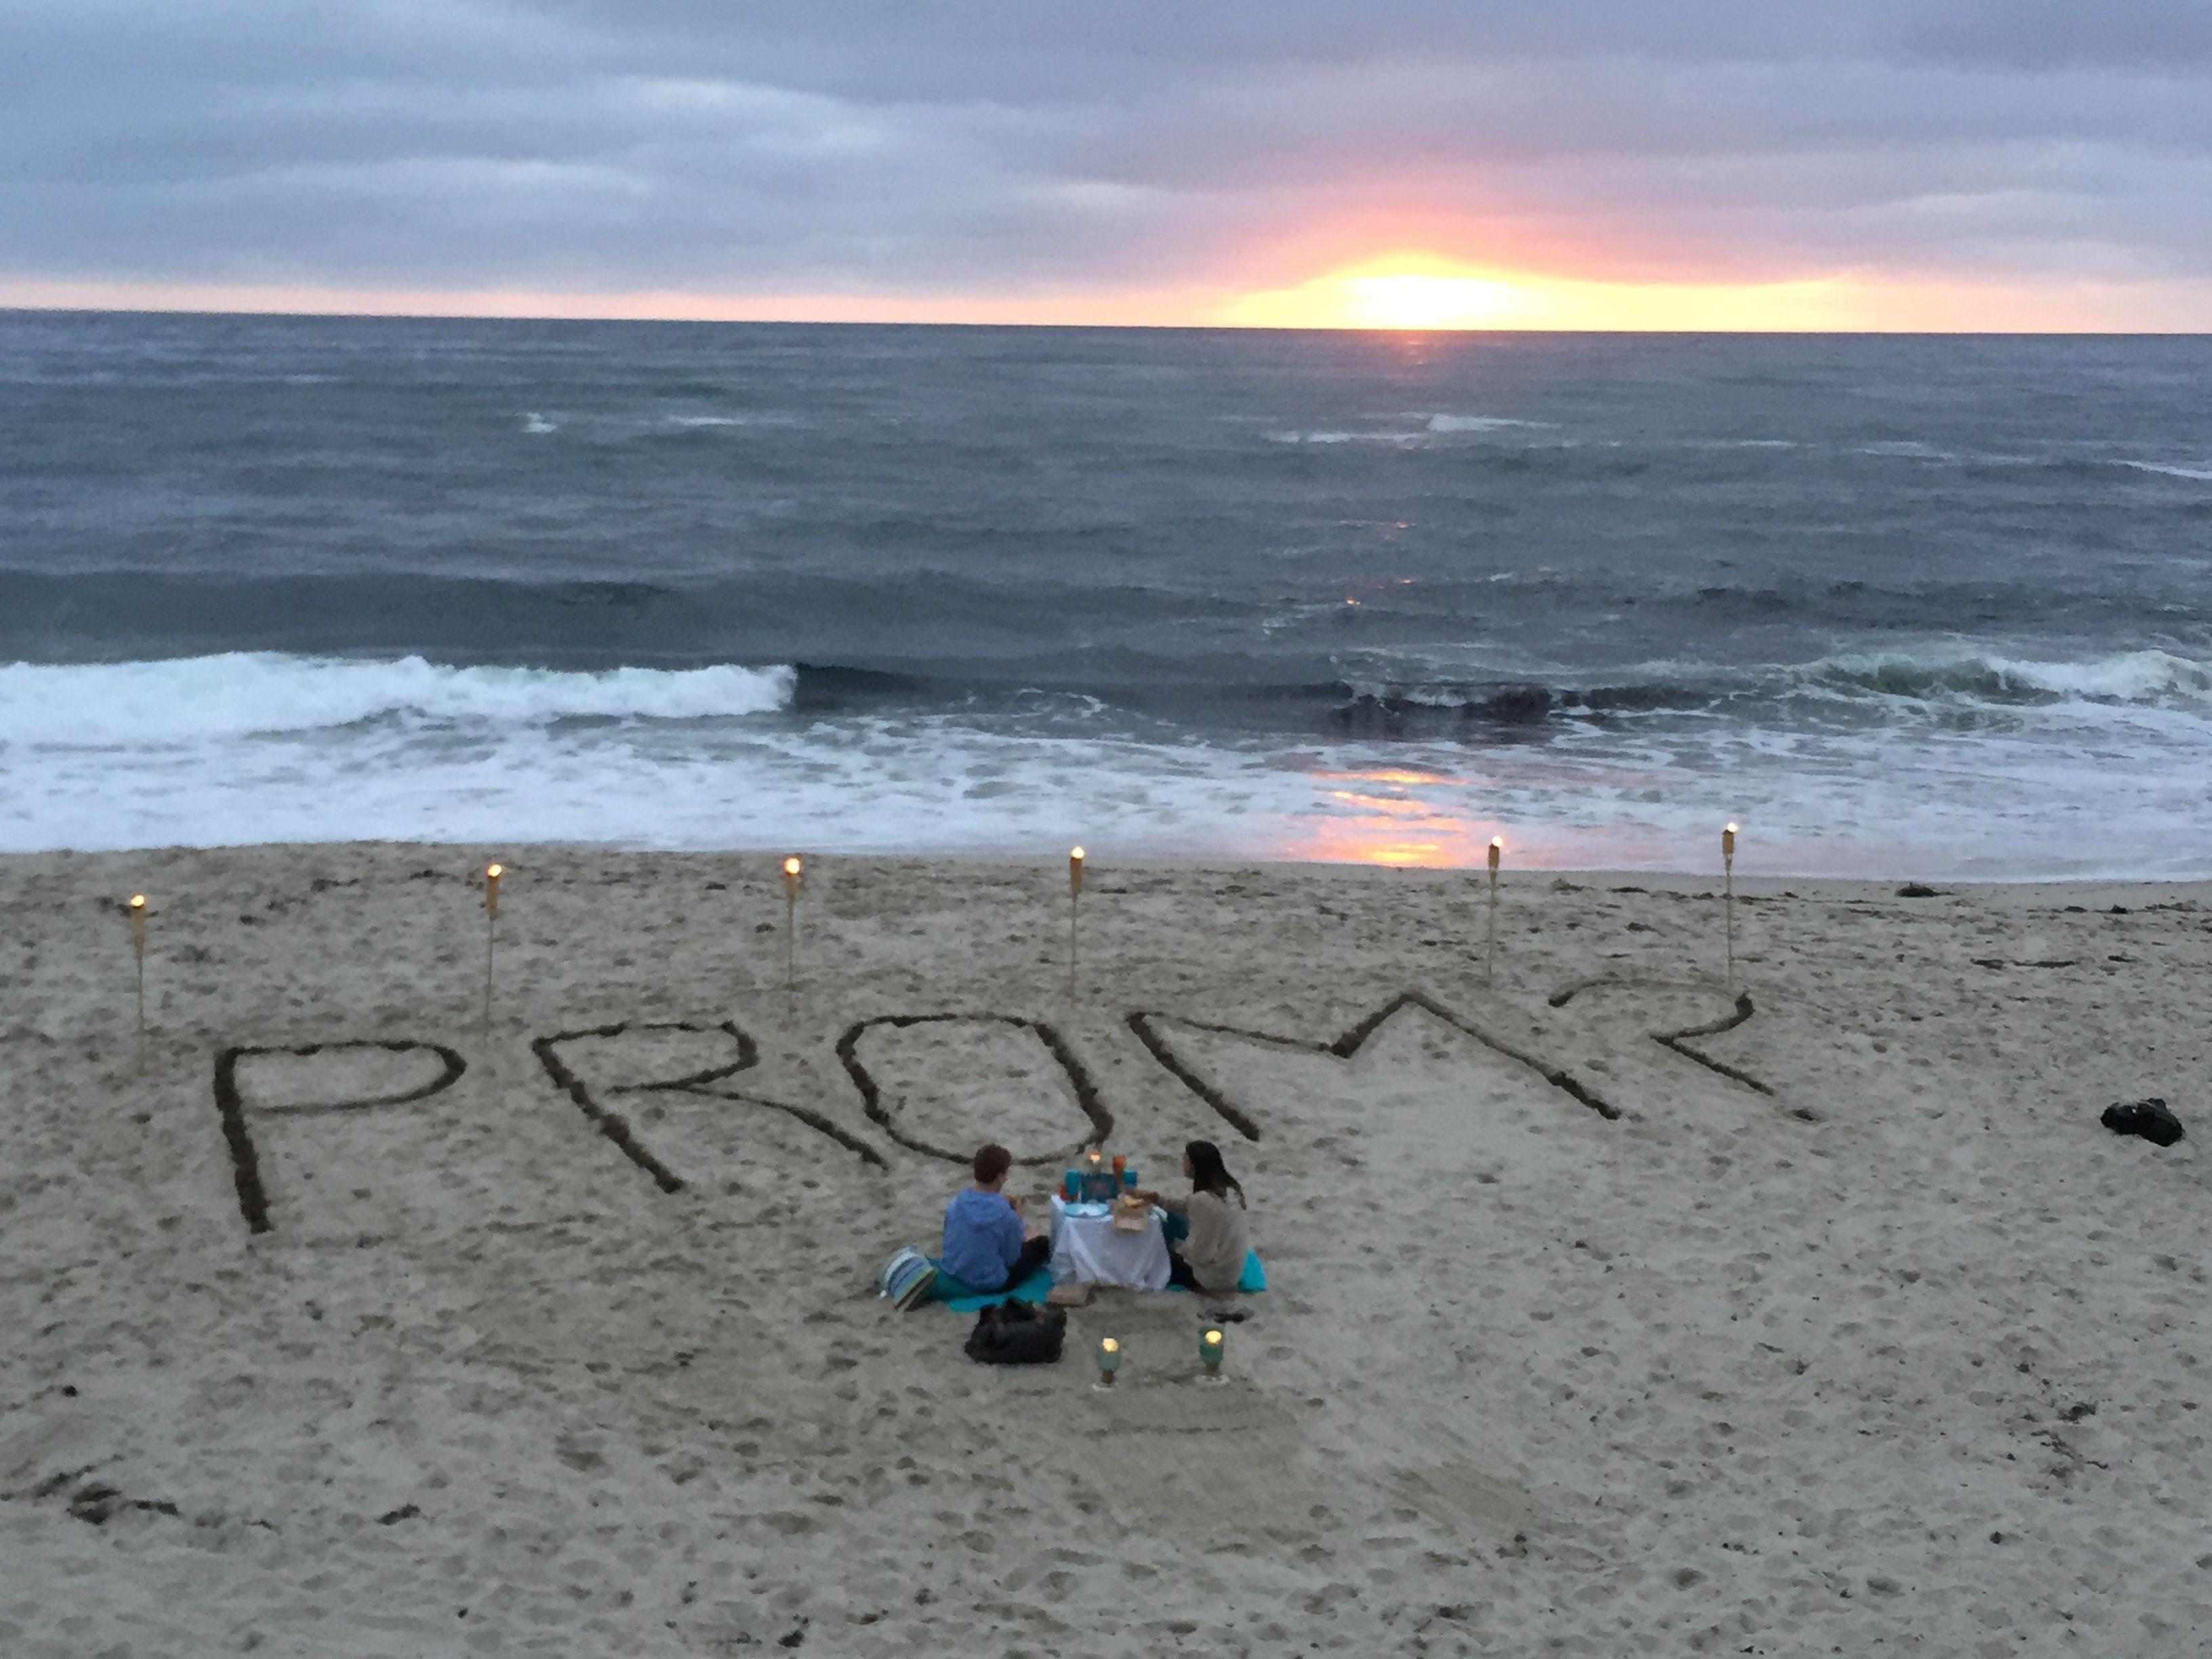 romantic sunset prom proposal promposal romance john pinterest